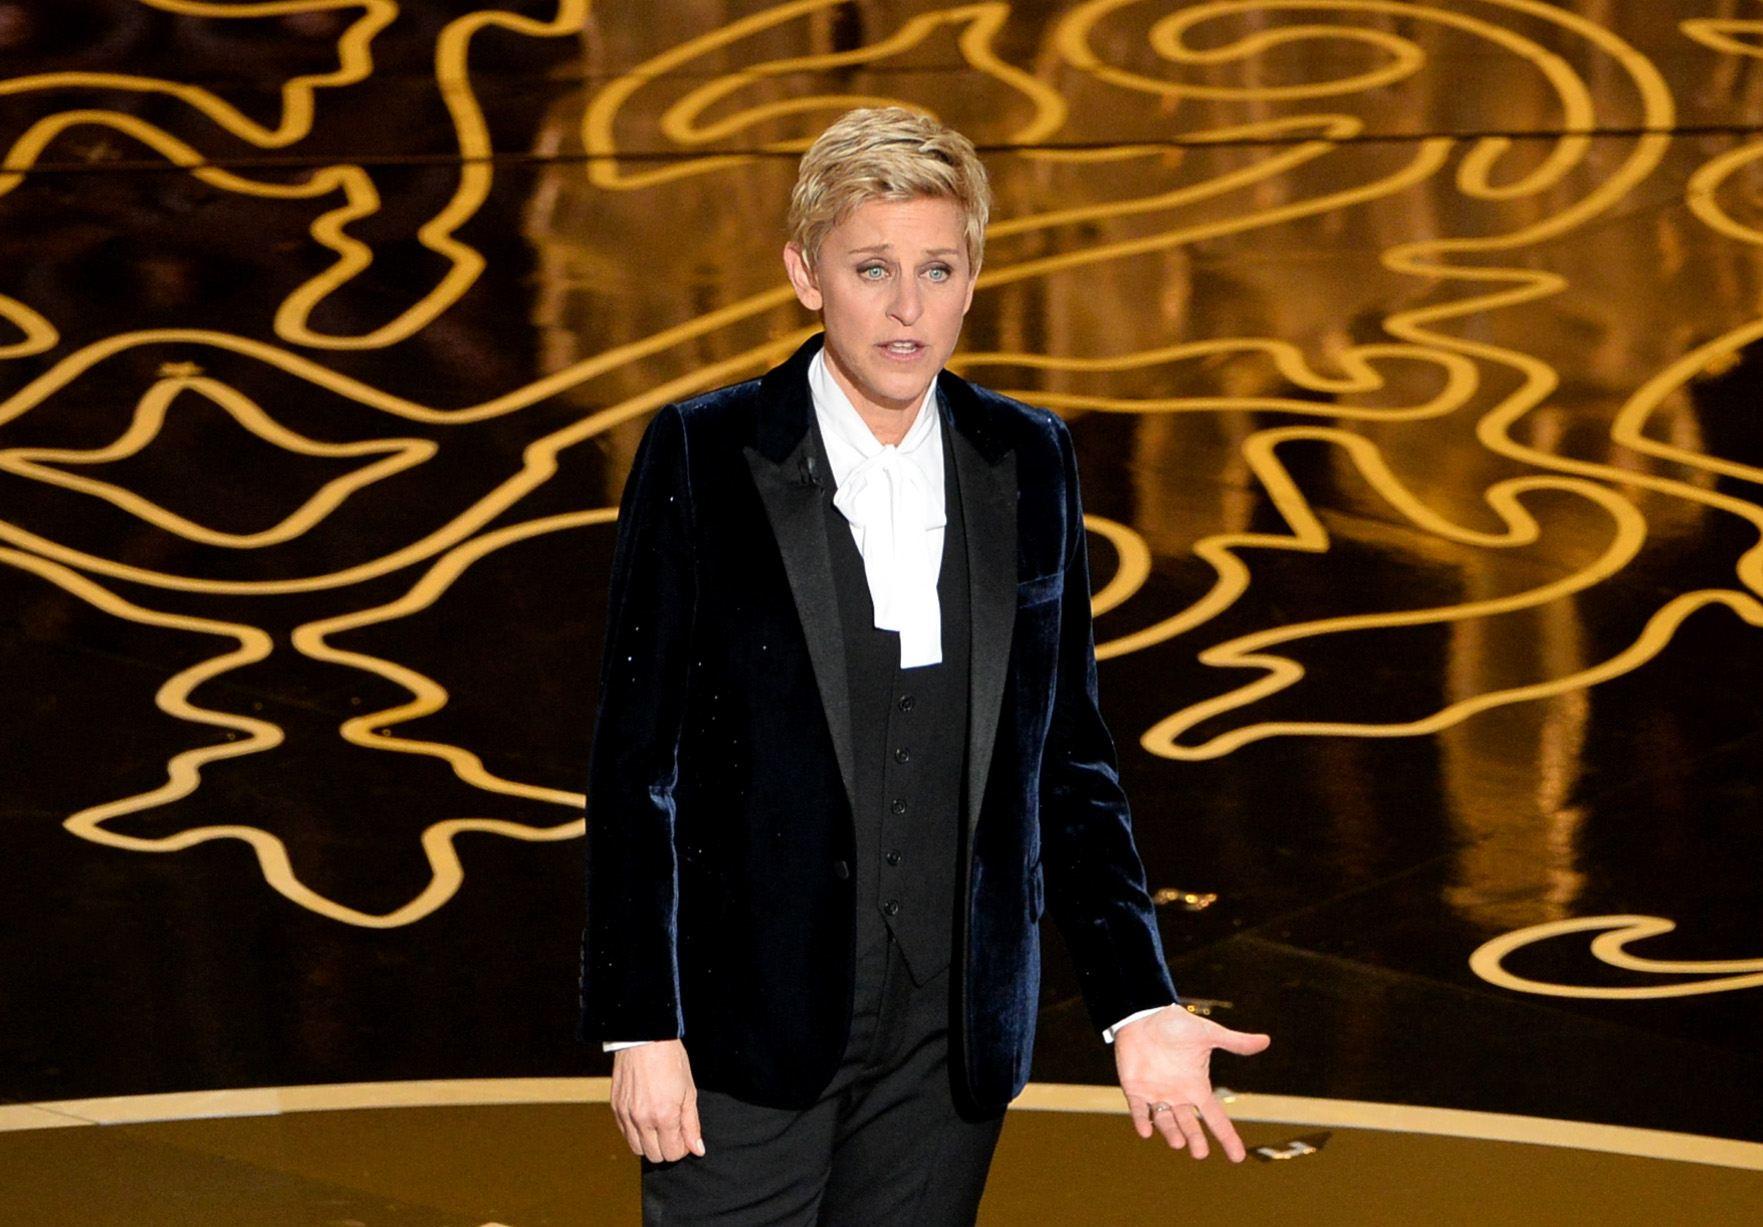 The Most Inspiring Ellen DeGeneres Moments Of All Time